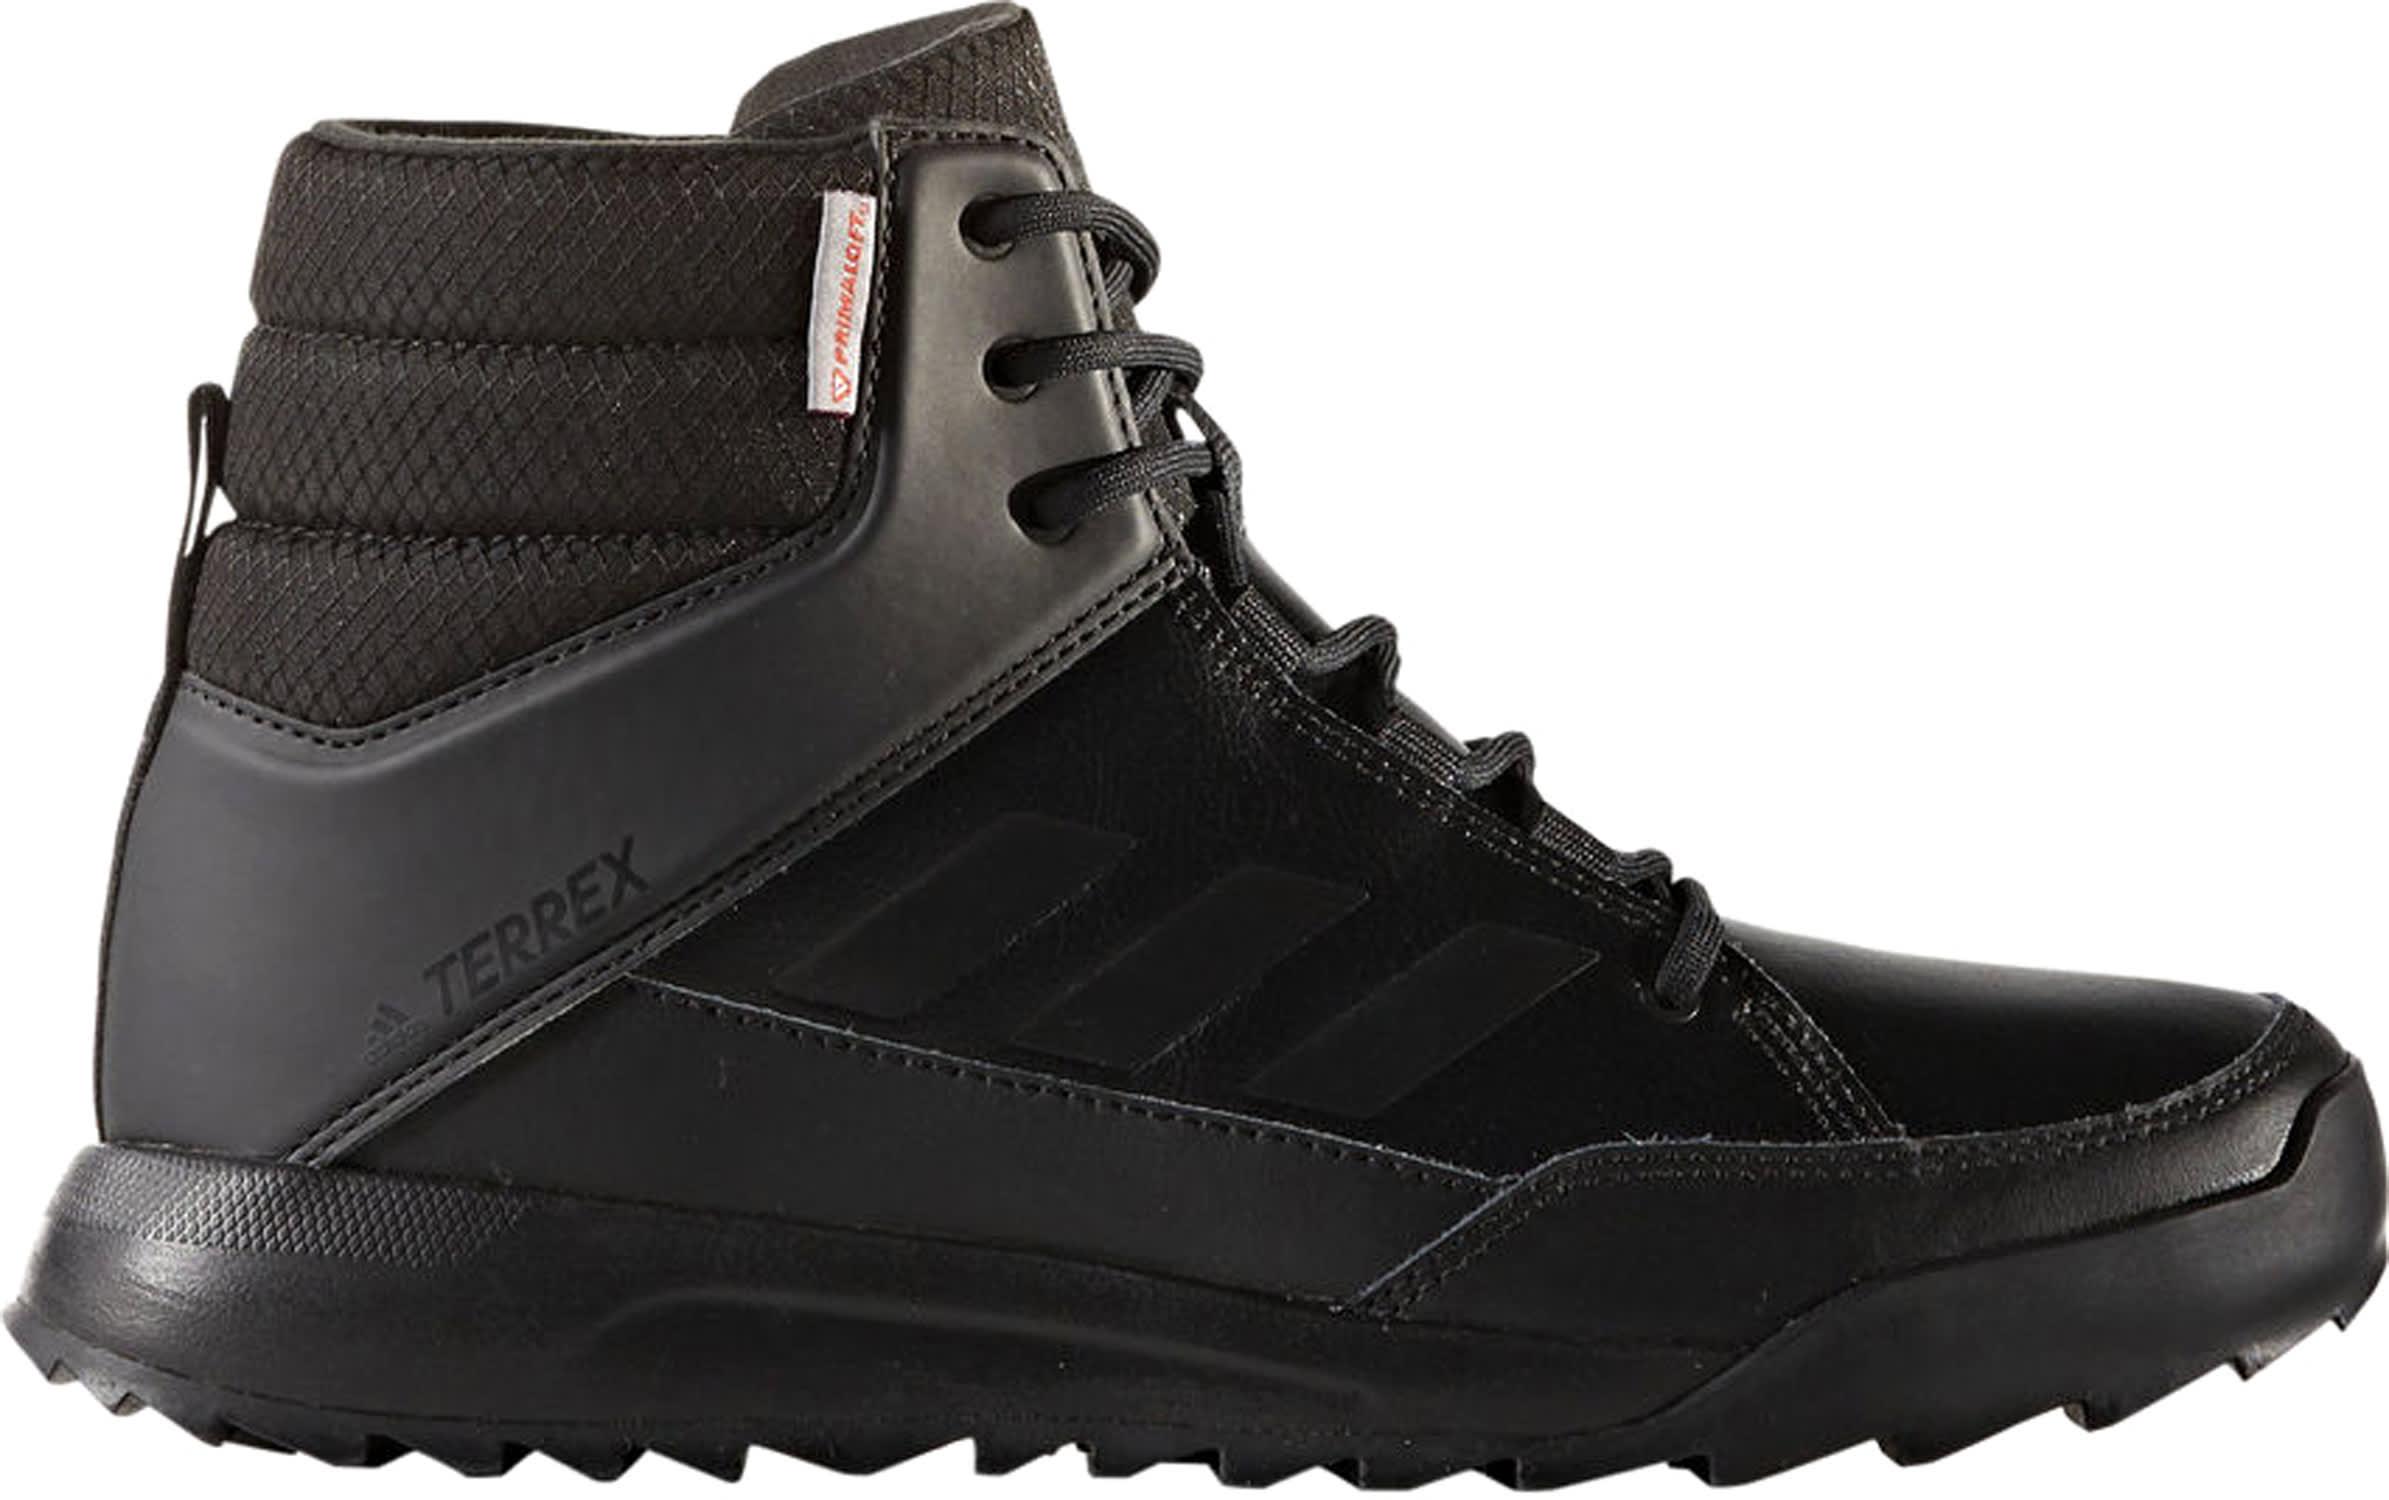 Adidas Micoach Shoe Tracker